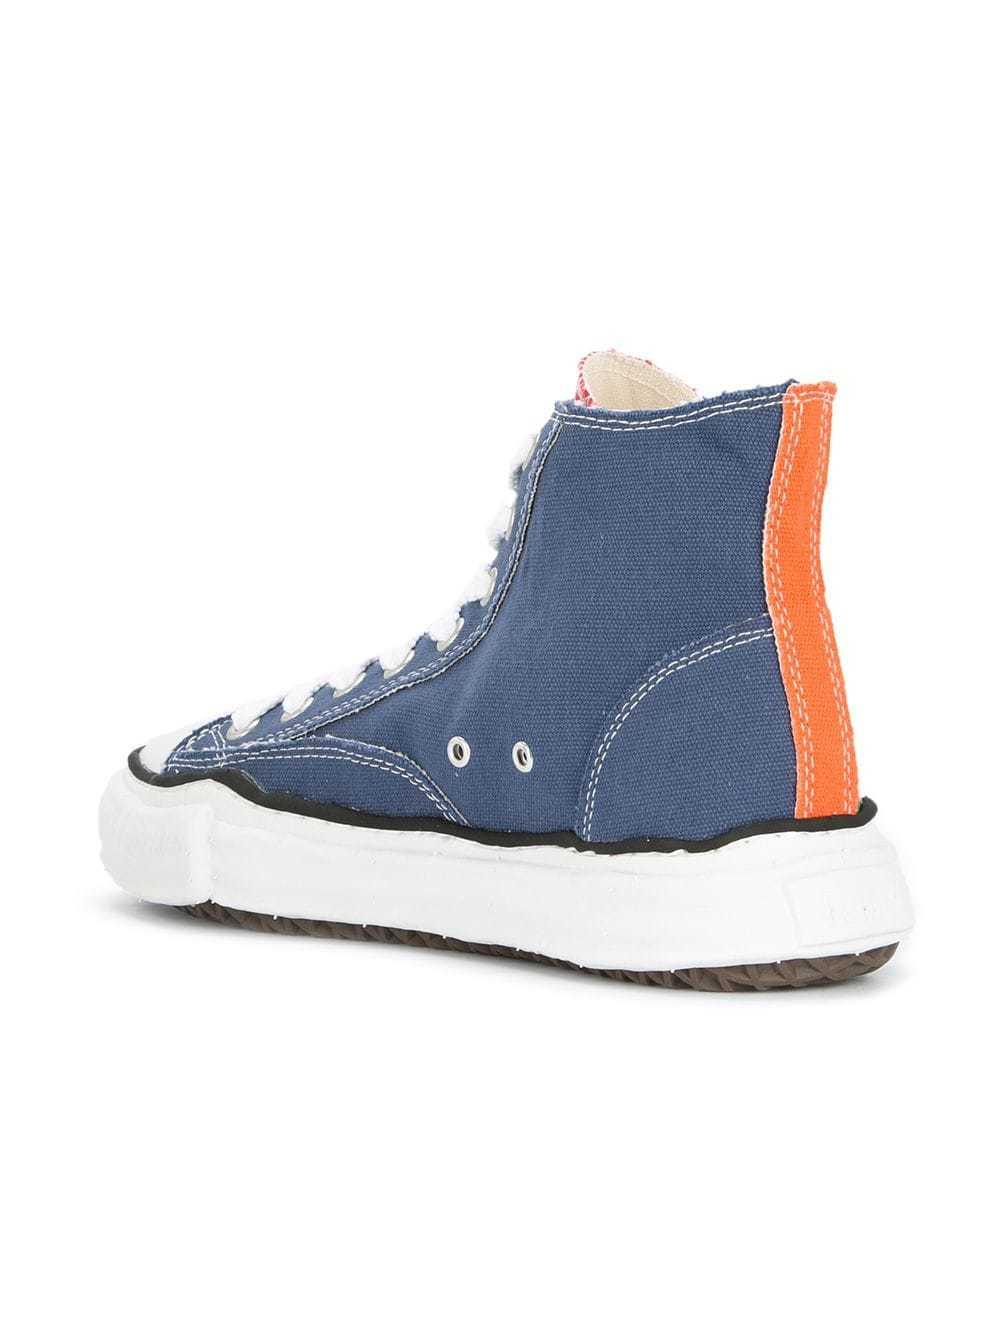 a96dacad8e1e ... Maison Mihara Yasuhiro Original Sole Hi Top Sneakers ...